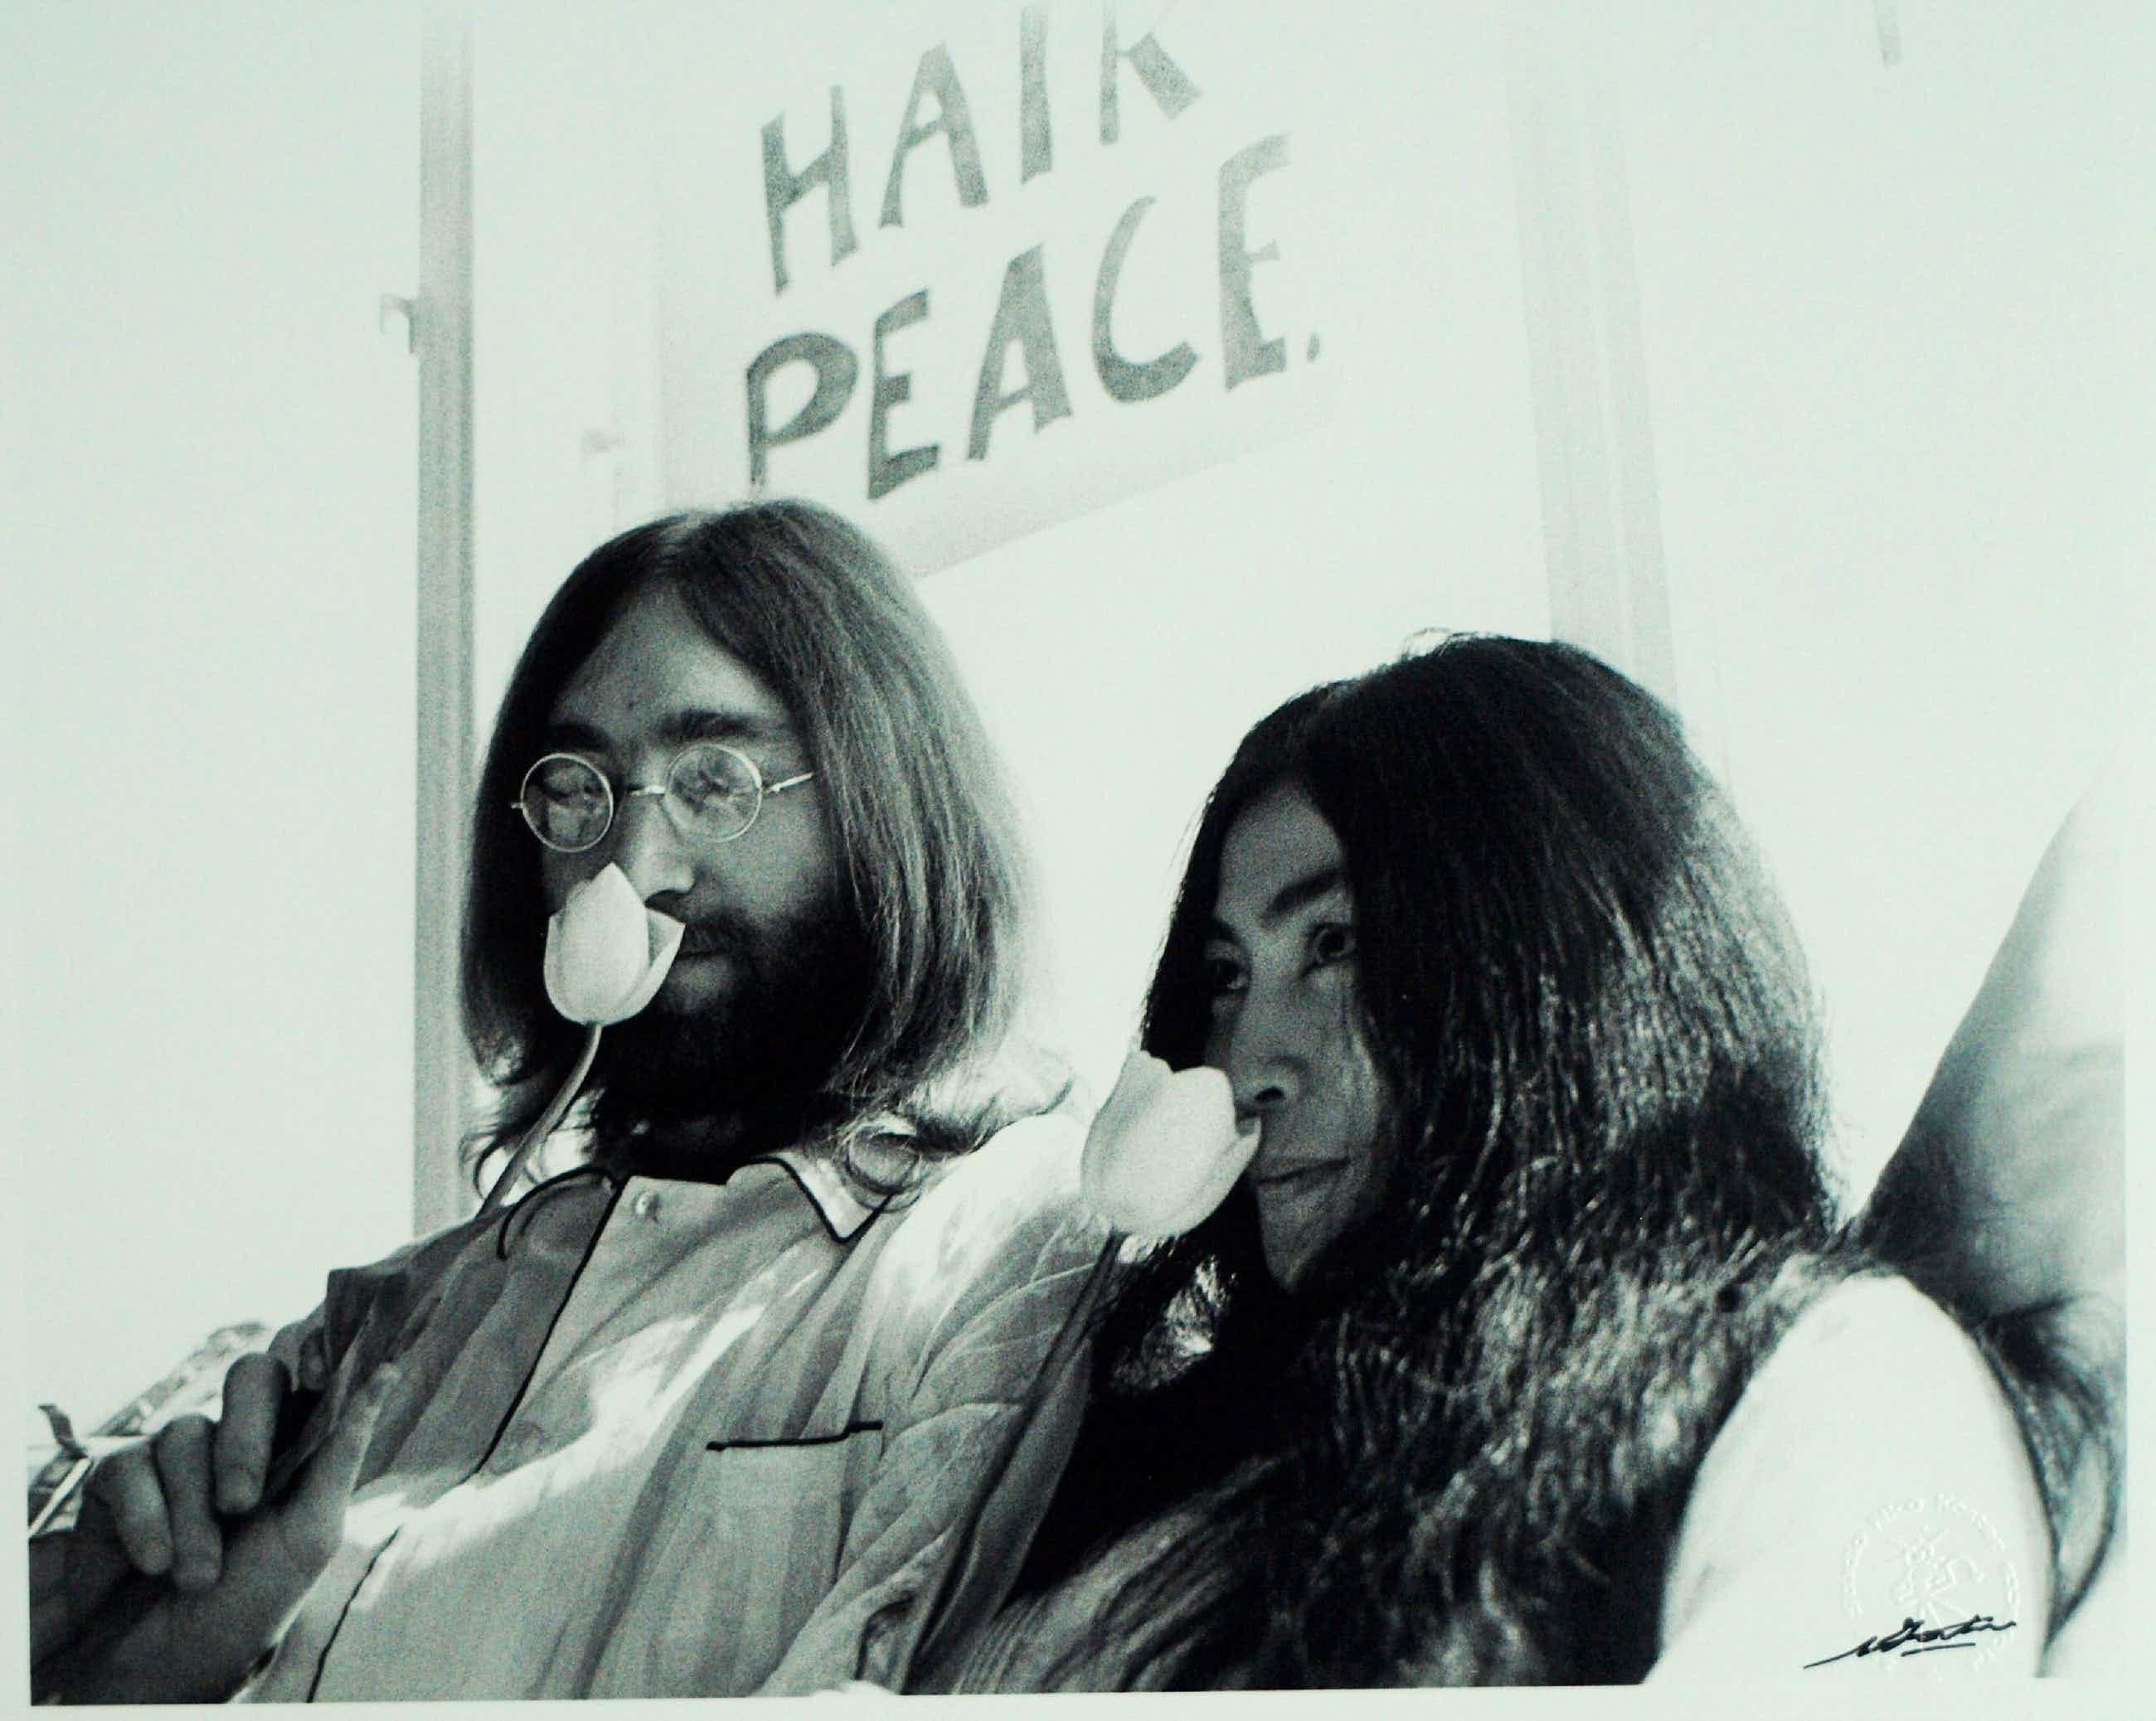 Nico Koster - Foto, John Lennon , Hilton Hotel tijdens de 'Bed-in for Peace' in '69 + Boek kopen? Bied vanaf 175!